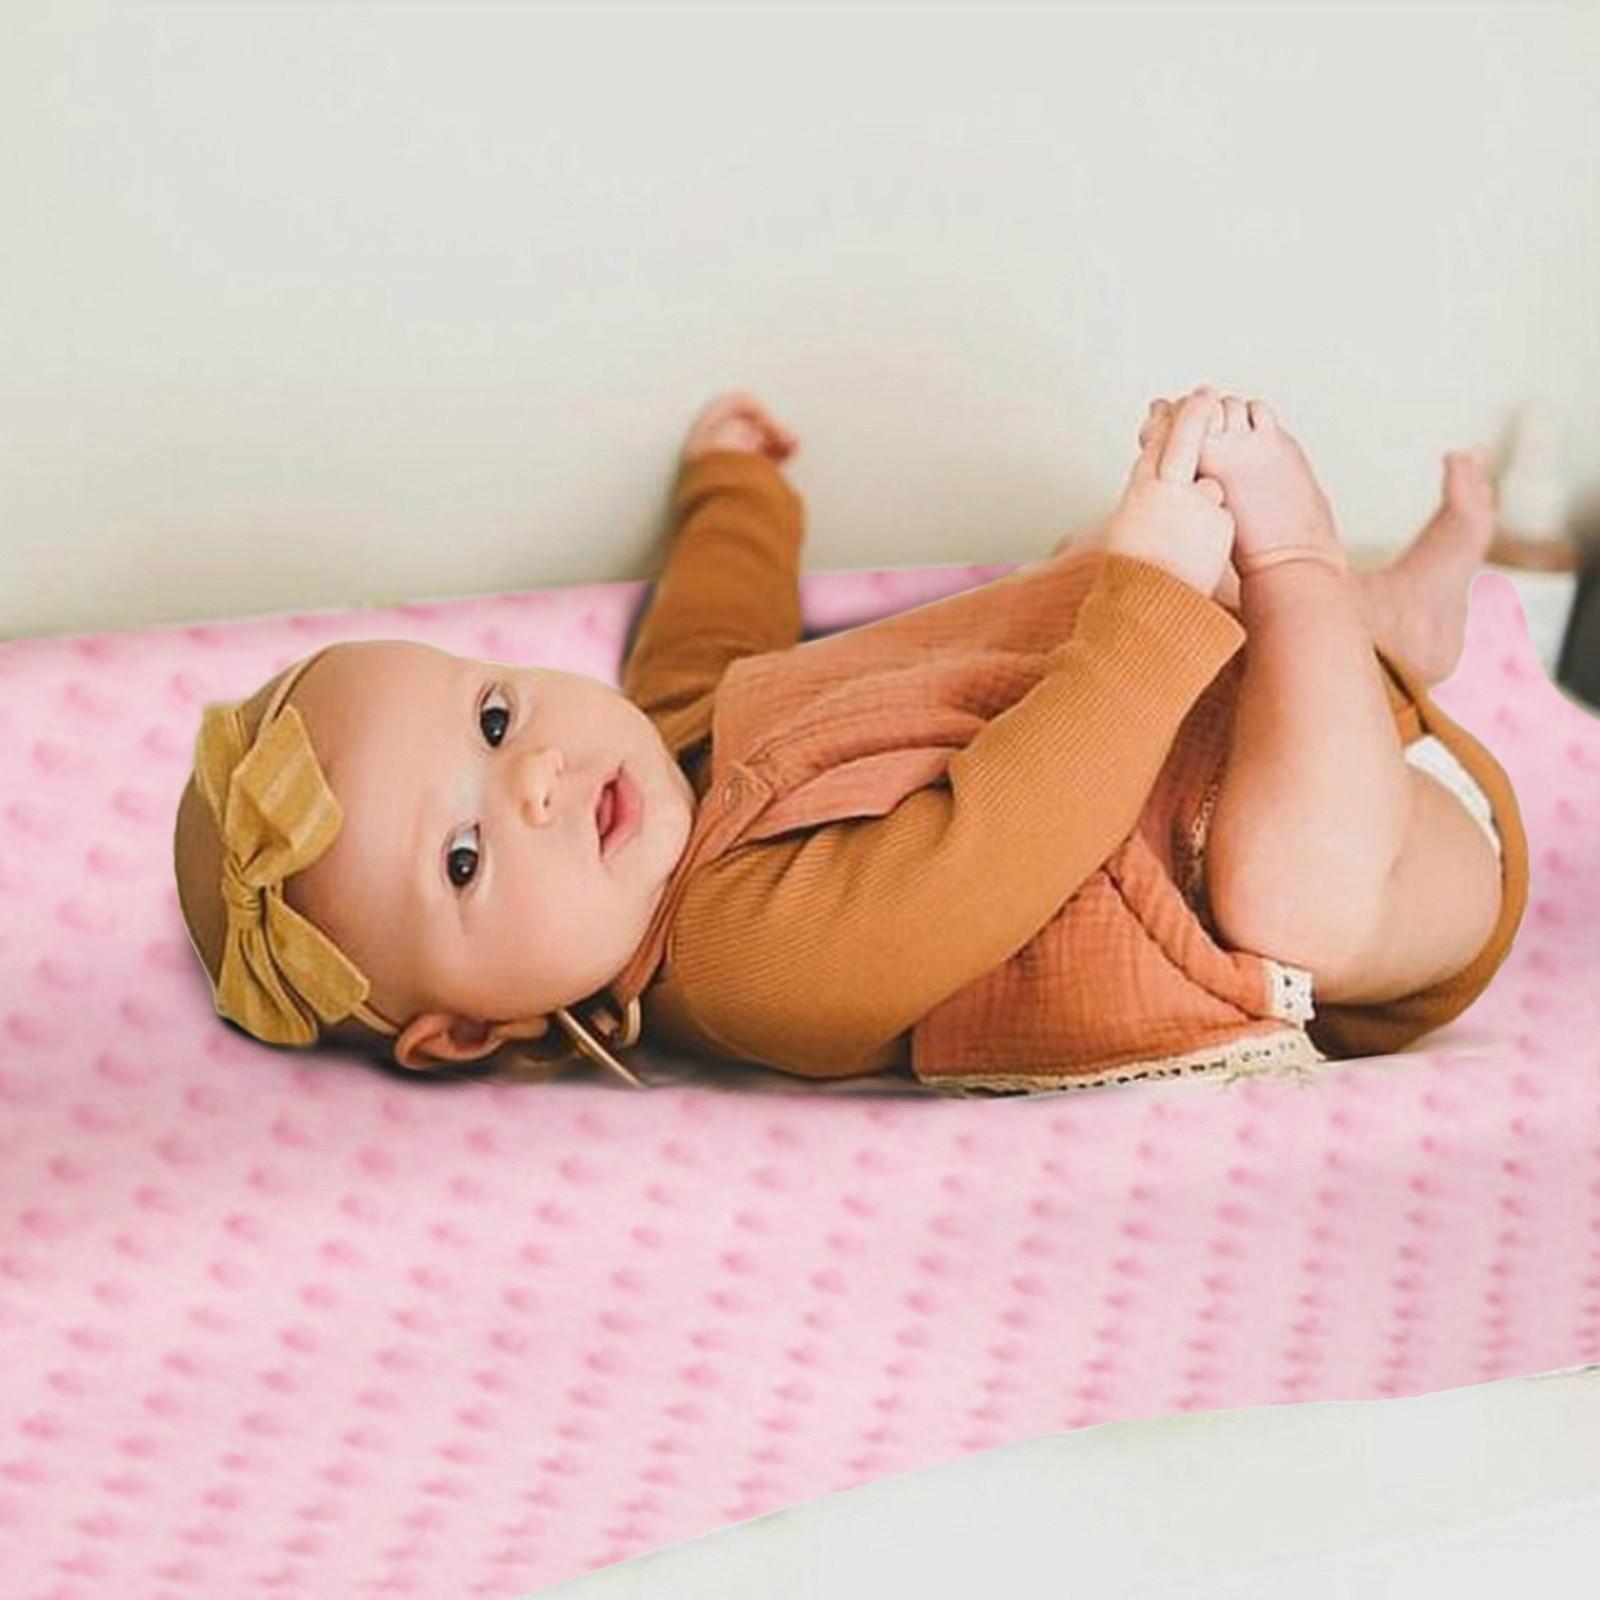 Kids Nursery Diaper baby diapers Changing Pad Cover Changing Mat Cover Changing Table Cover Baby Changing mat подгузники